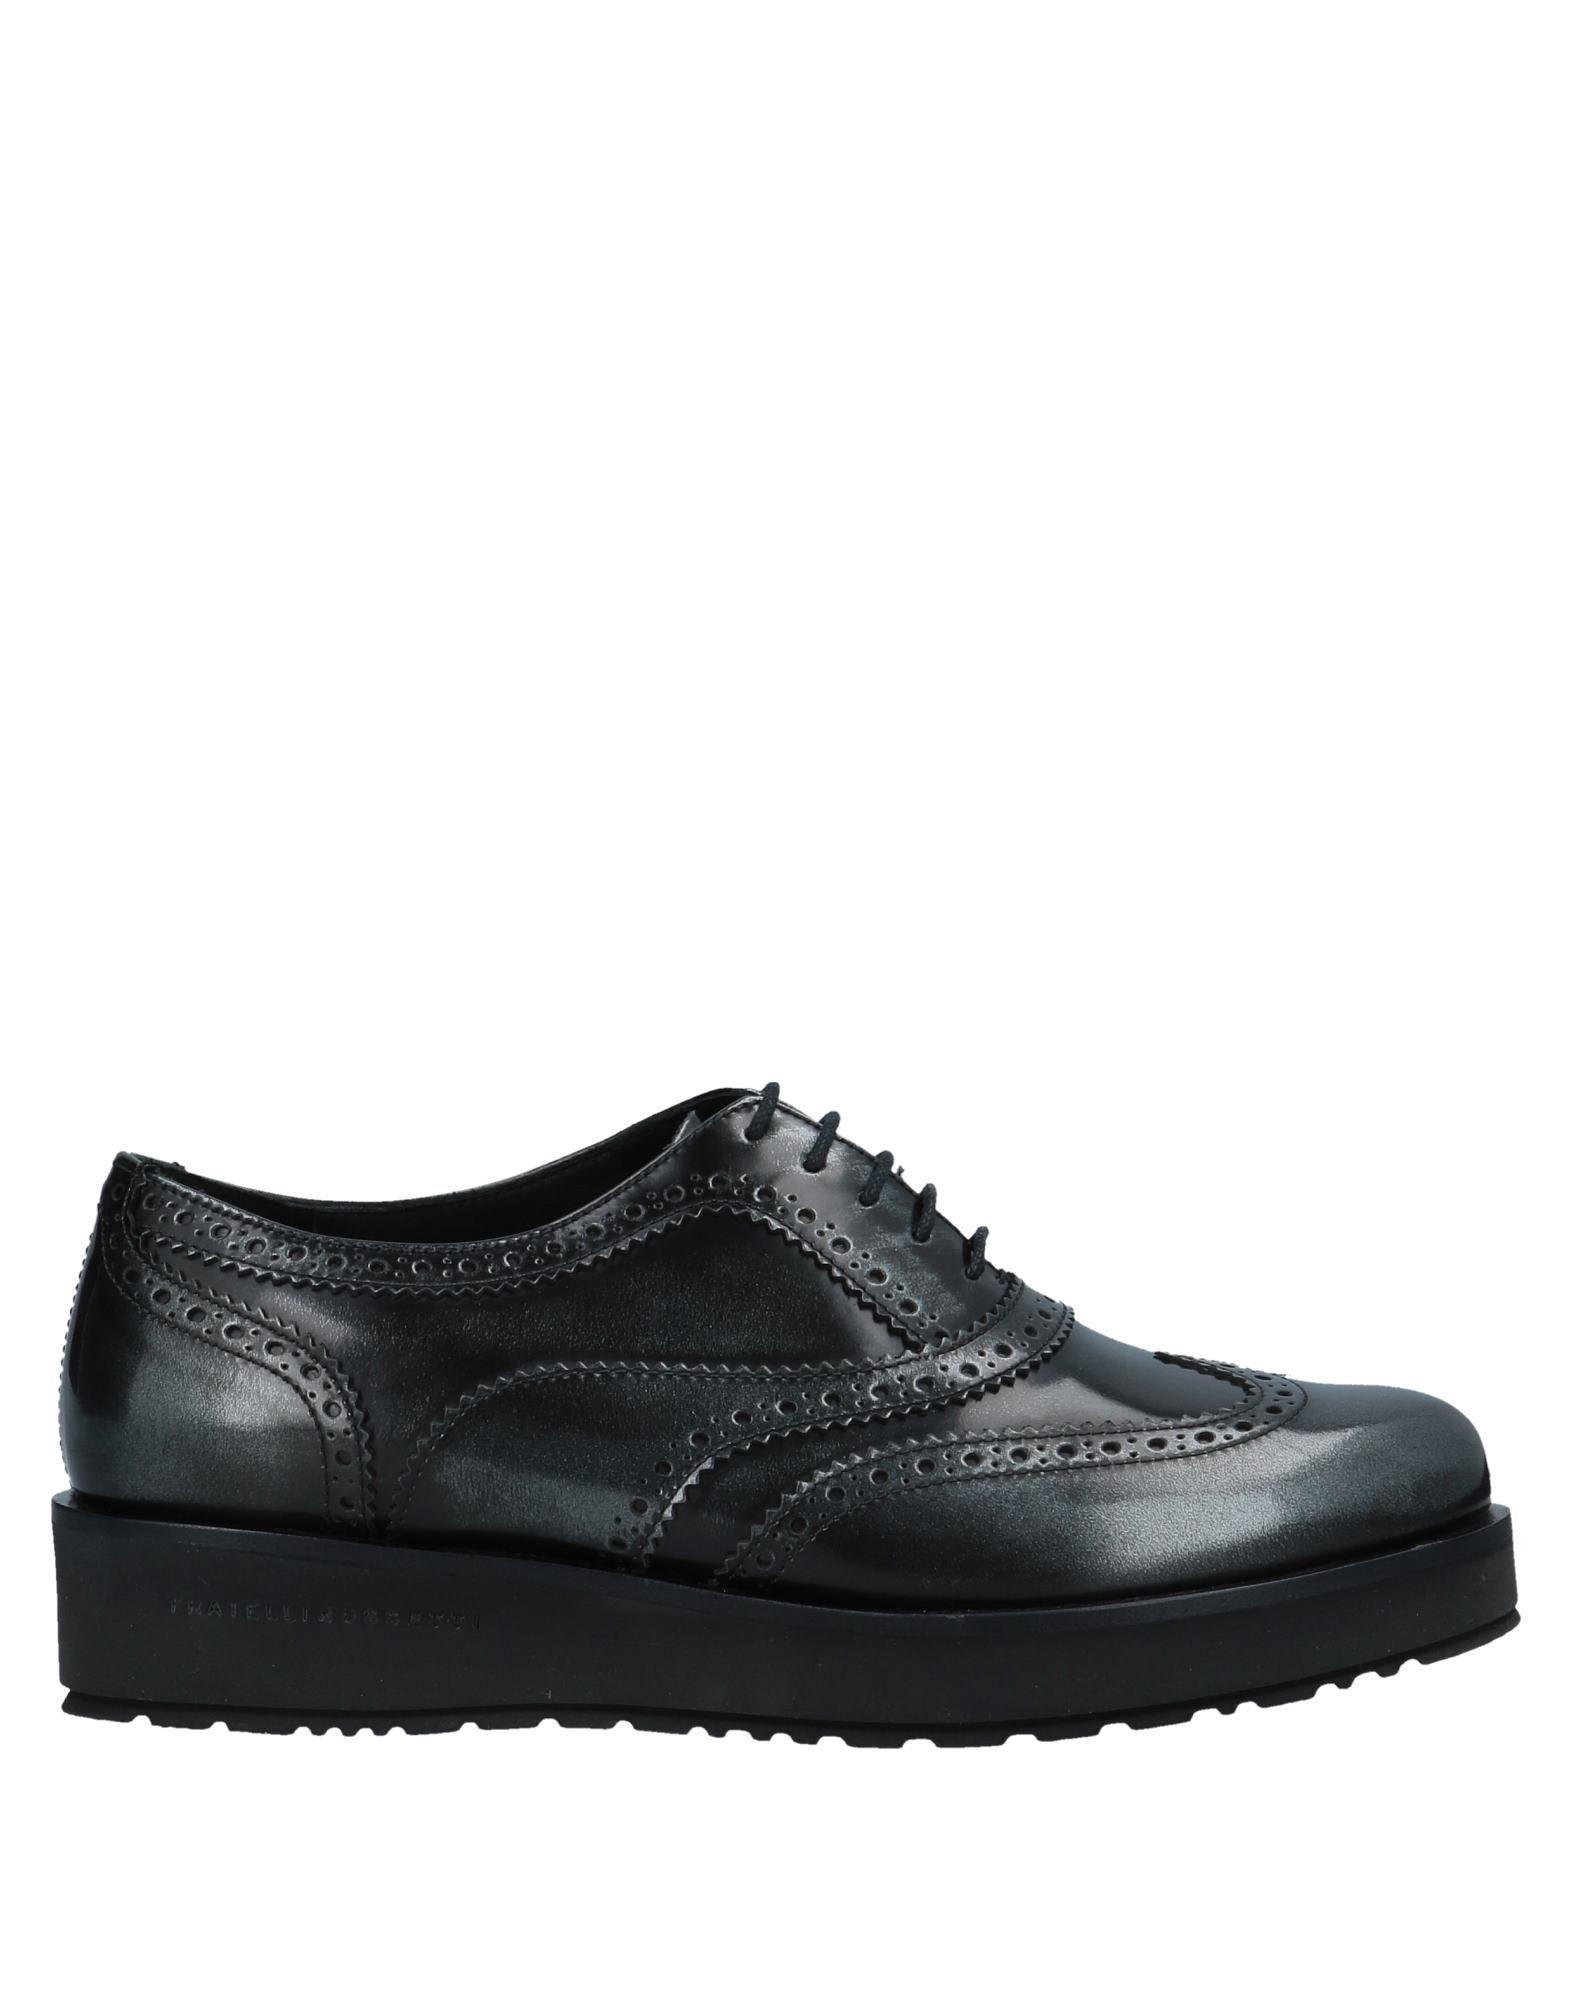 Fratelli Rossetti Schnürschuhe Damen  11556807KRGut aussehende strapazierfähige Schuhe